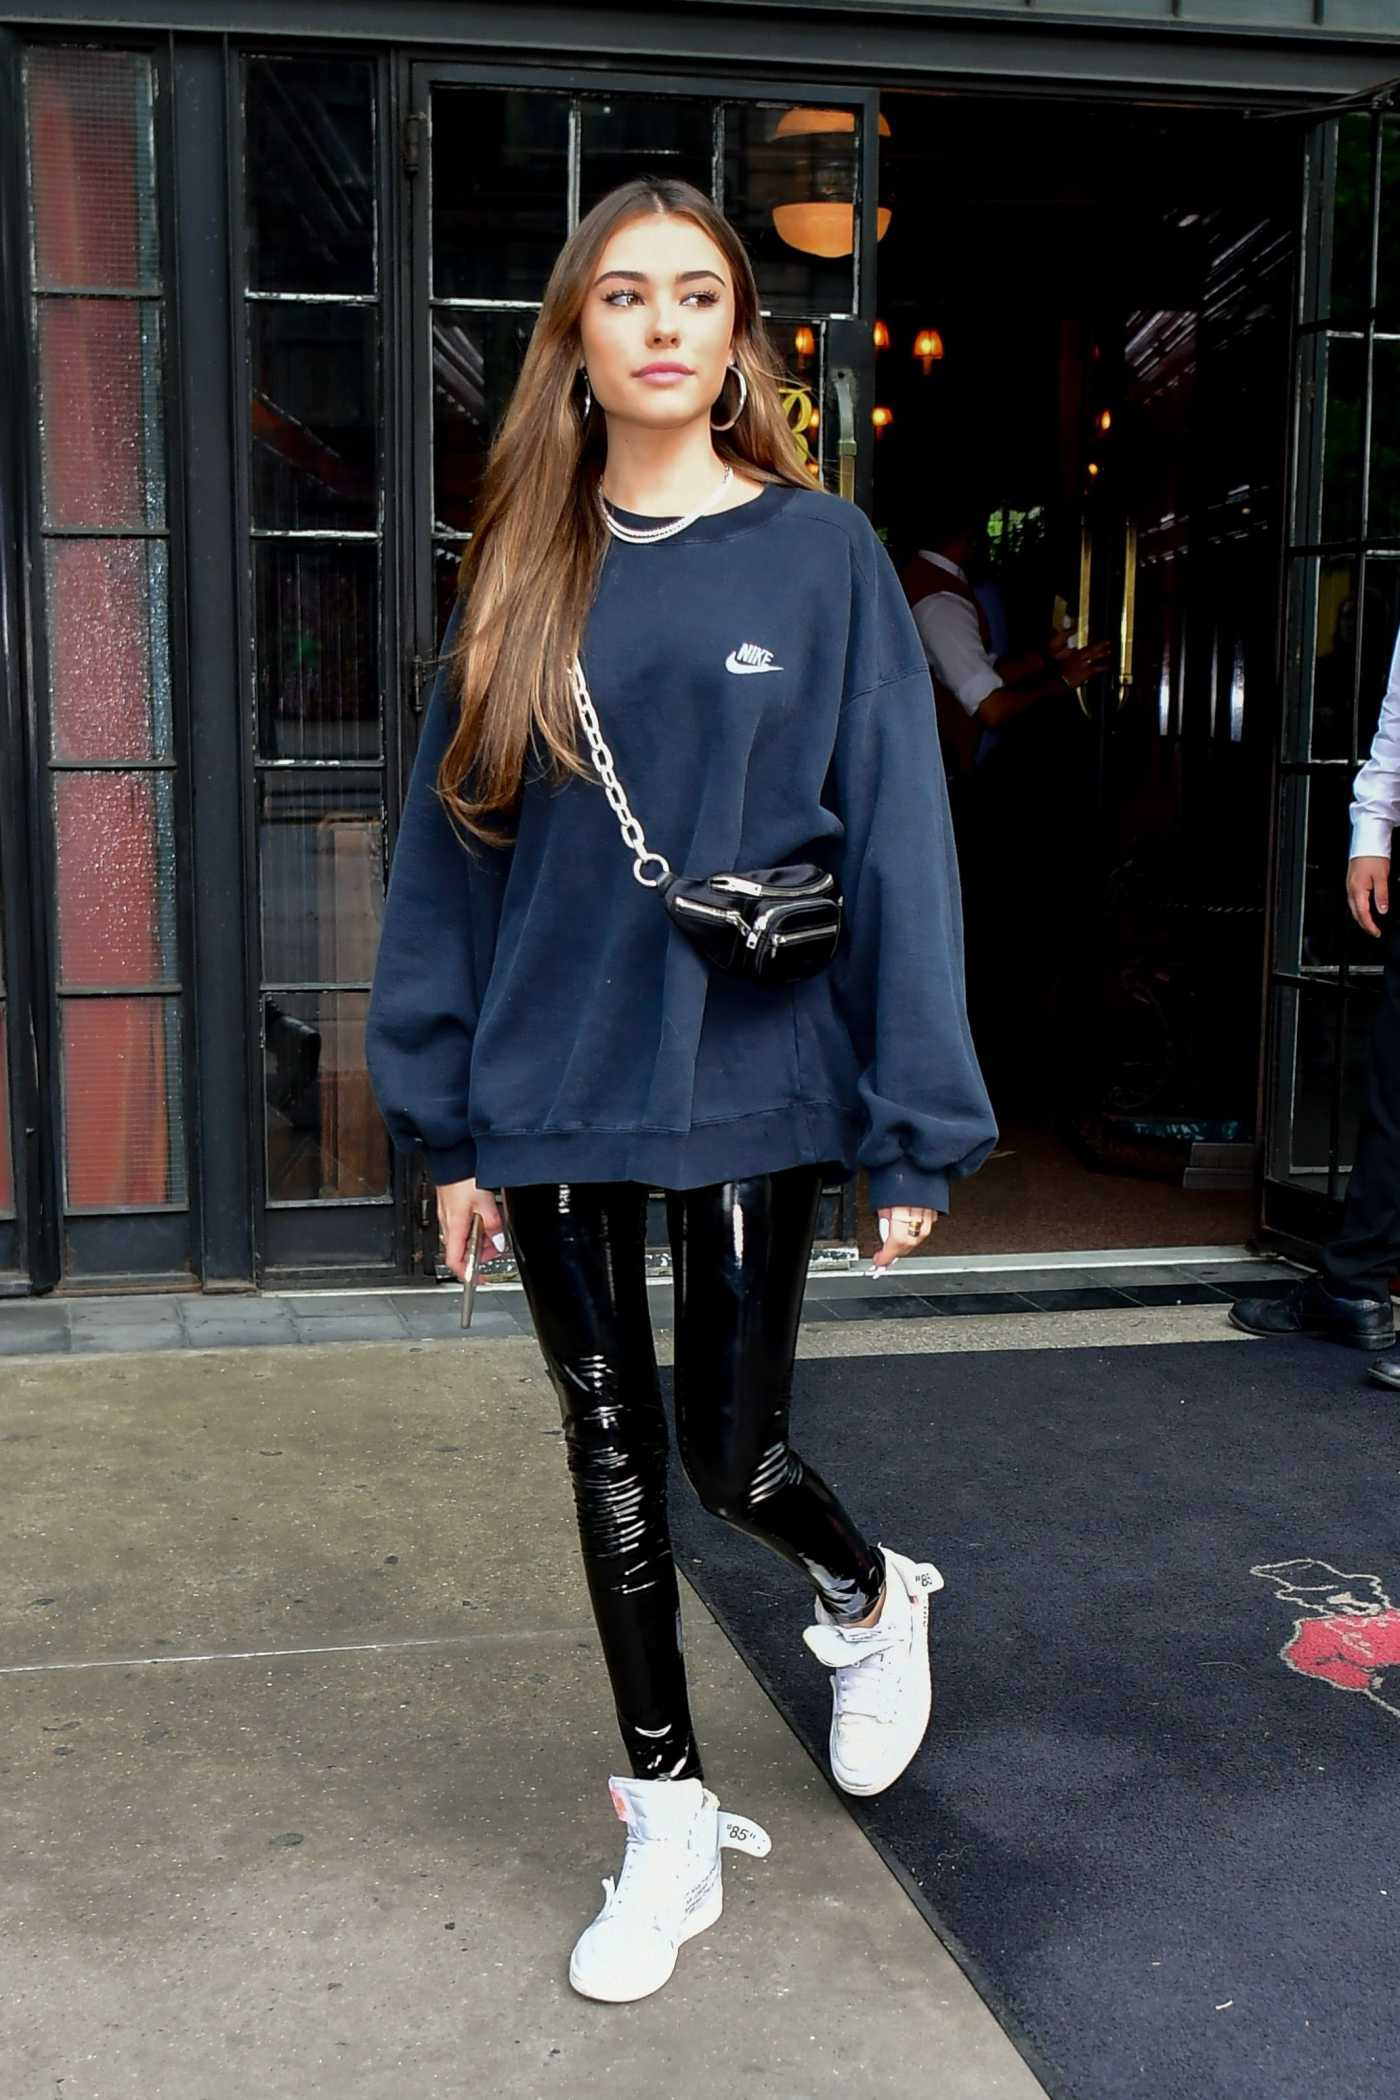 Madison Beer in a Black Oversized Nike Sweatshirt Leaves Her Hotel in NYC 05/10/2019